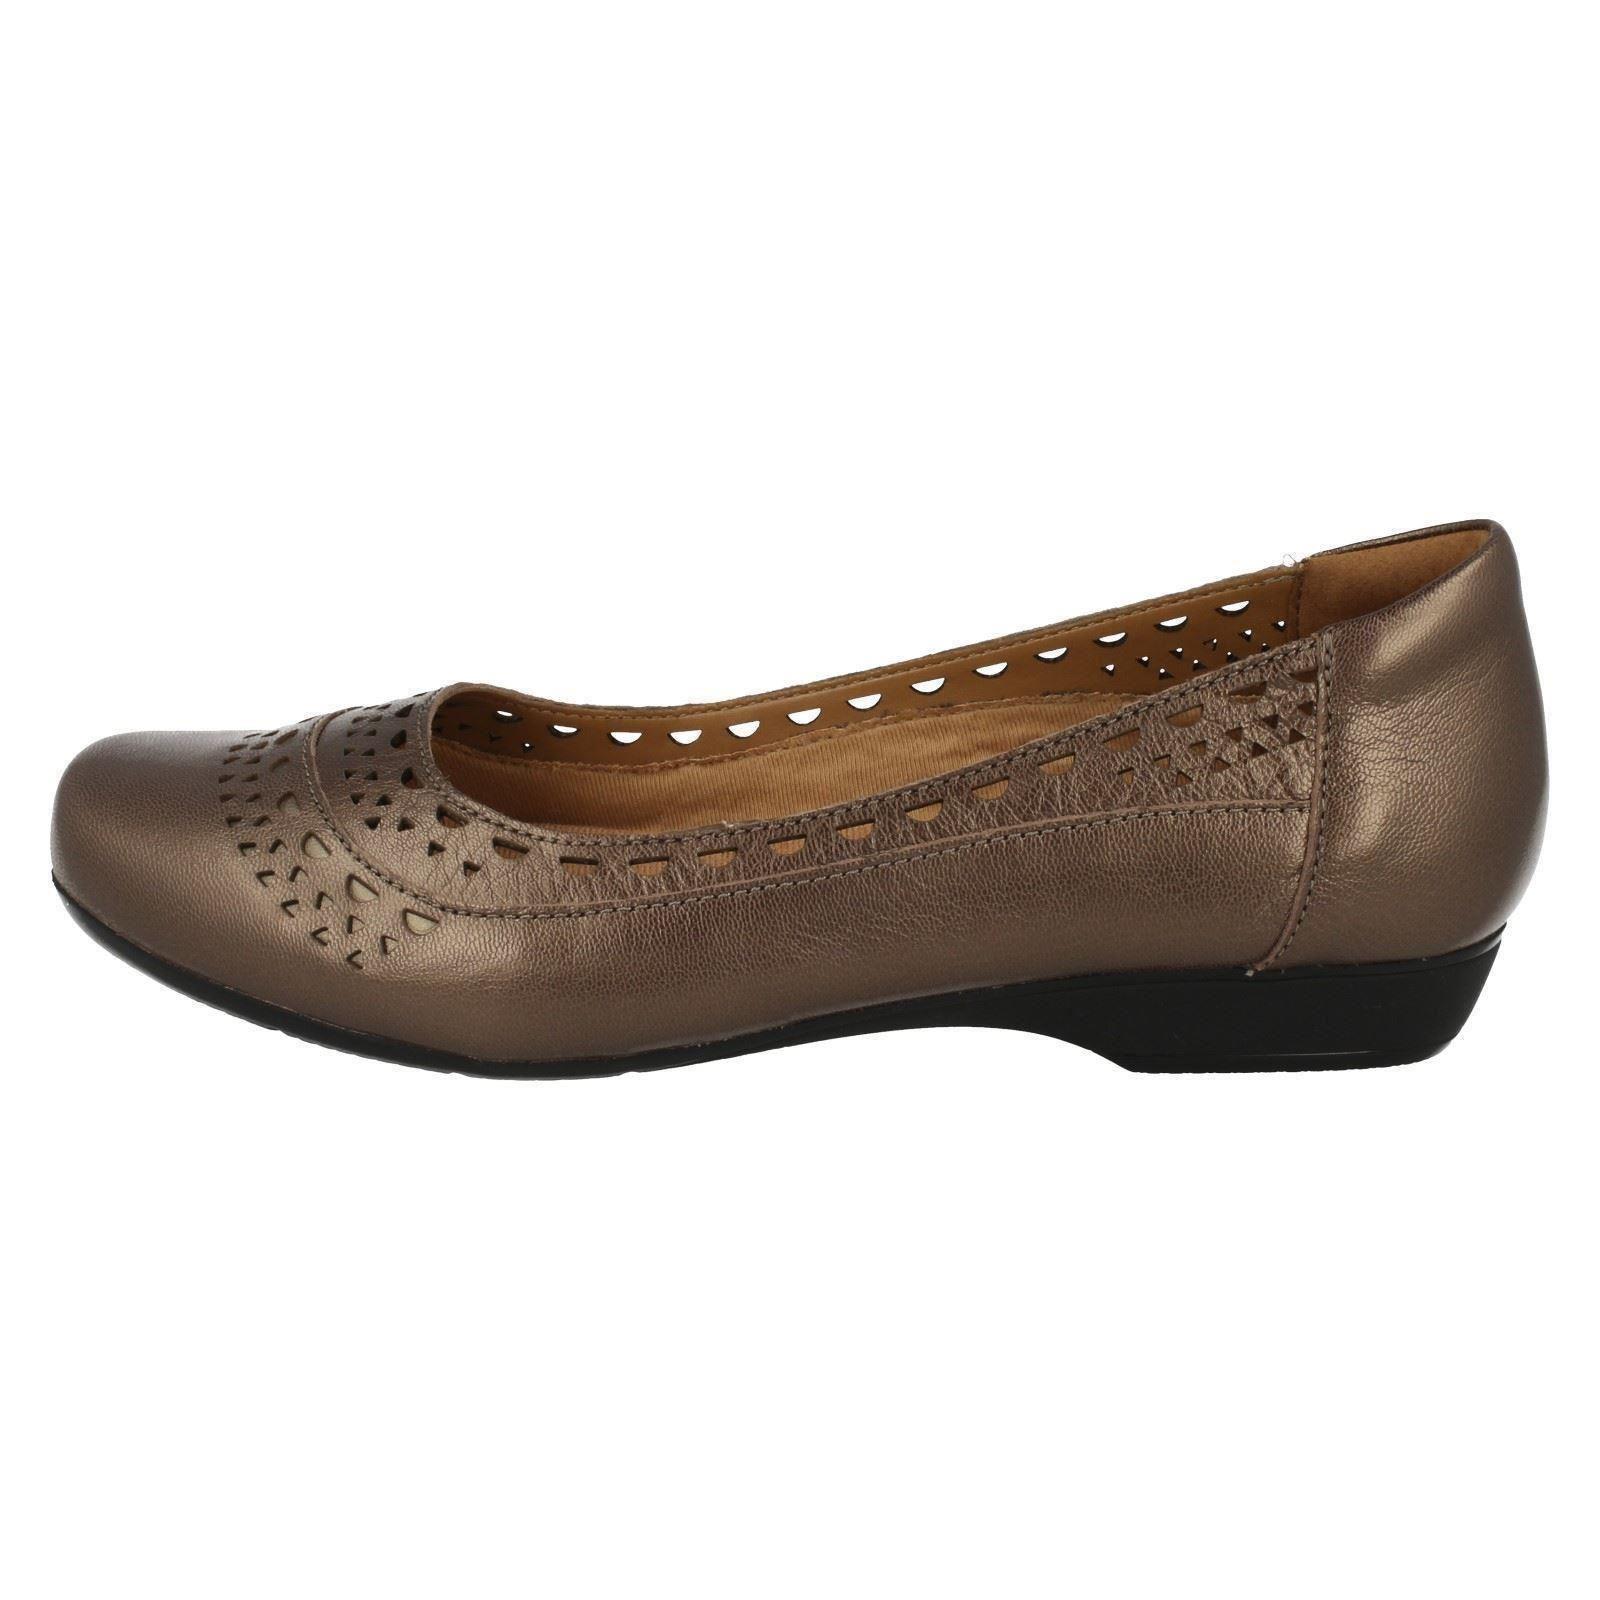 Blanche Flats Ballerina Melody Pewter Señoras Clarks marrón 5znqT